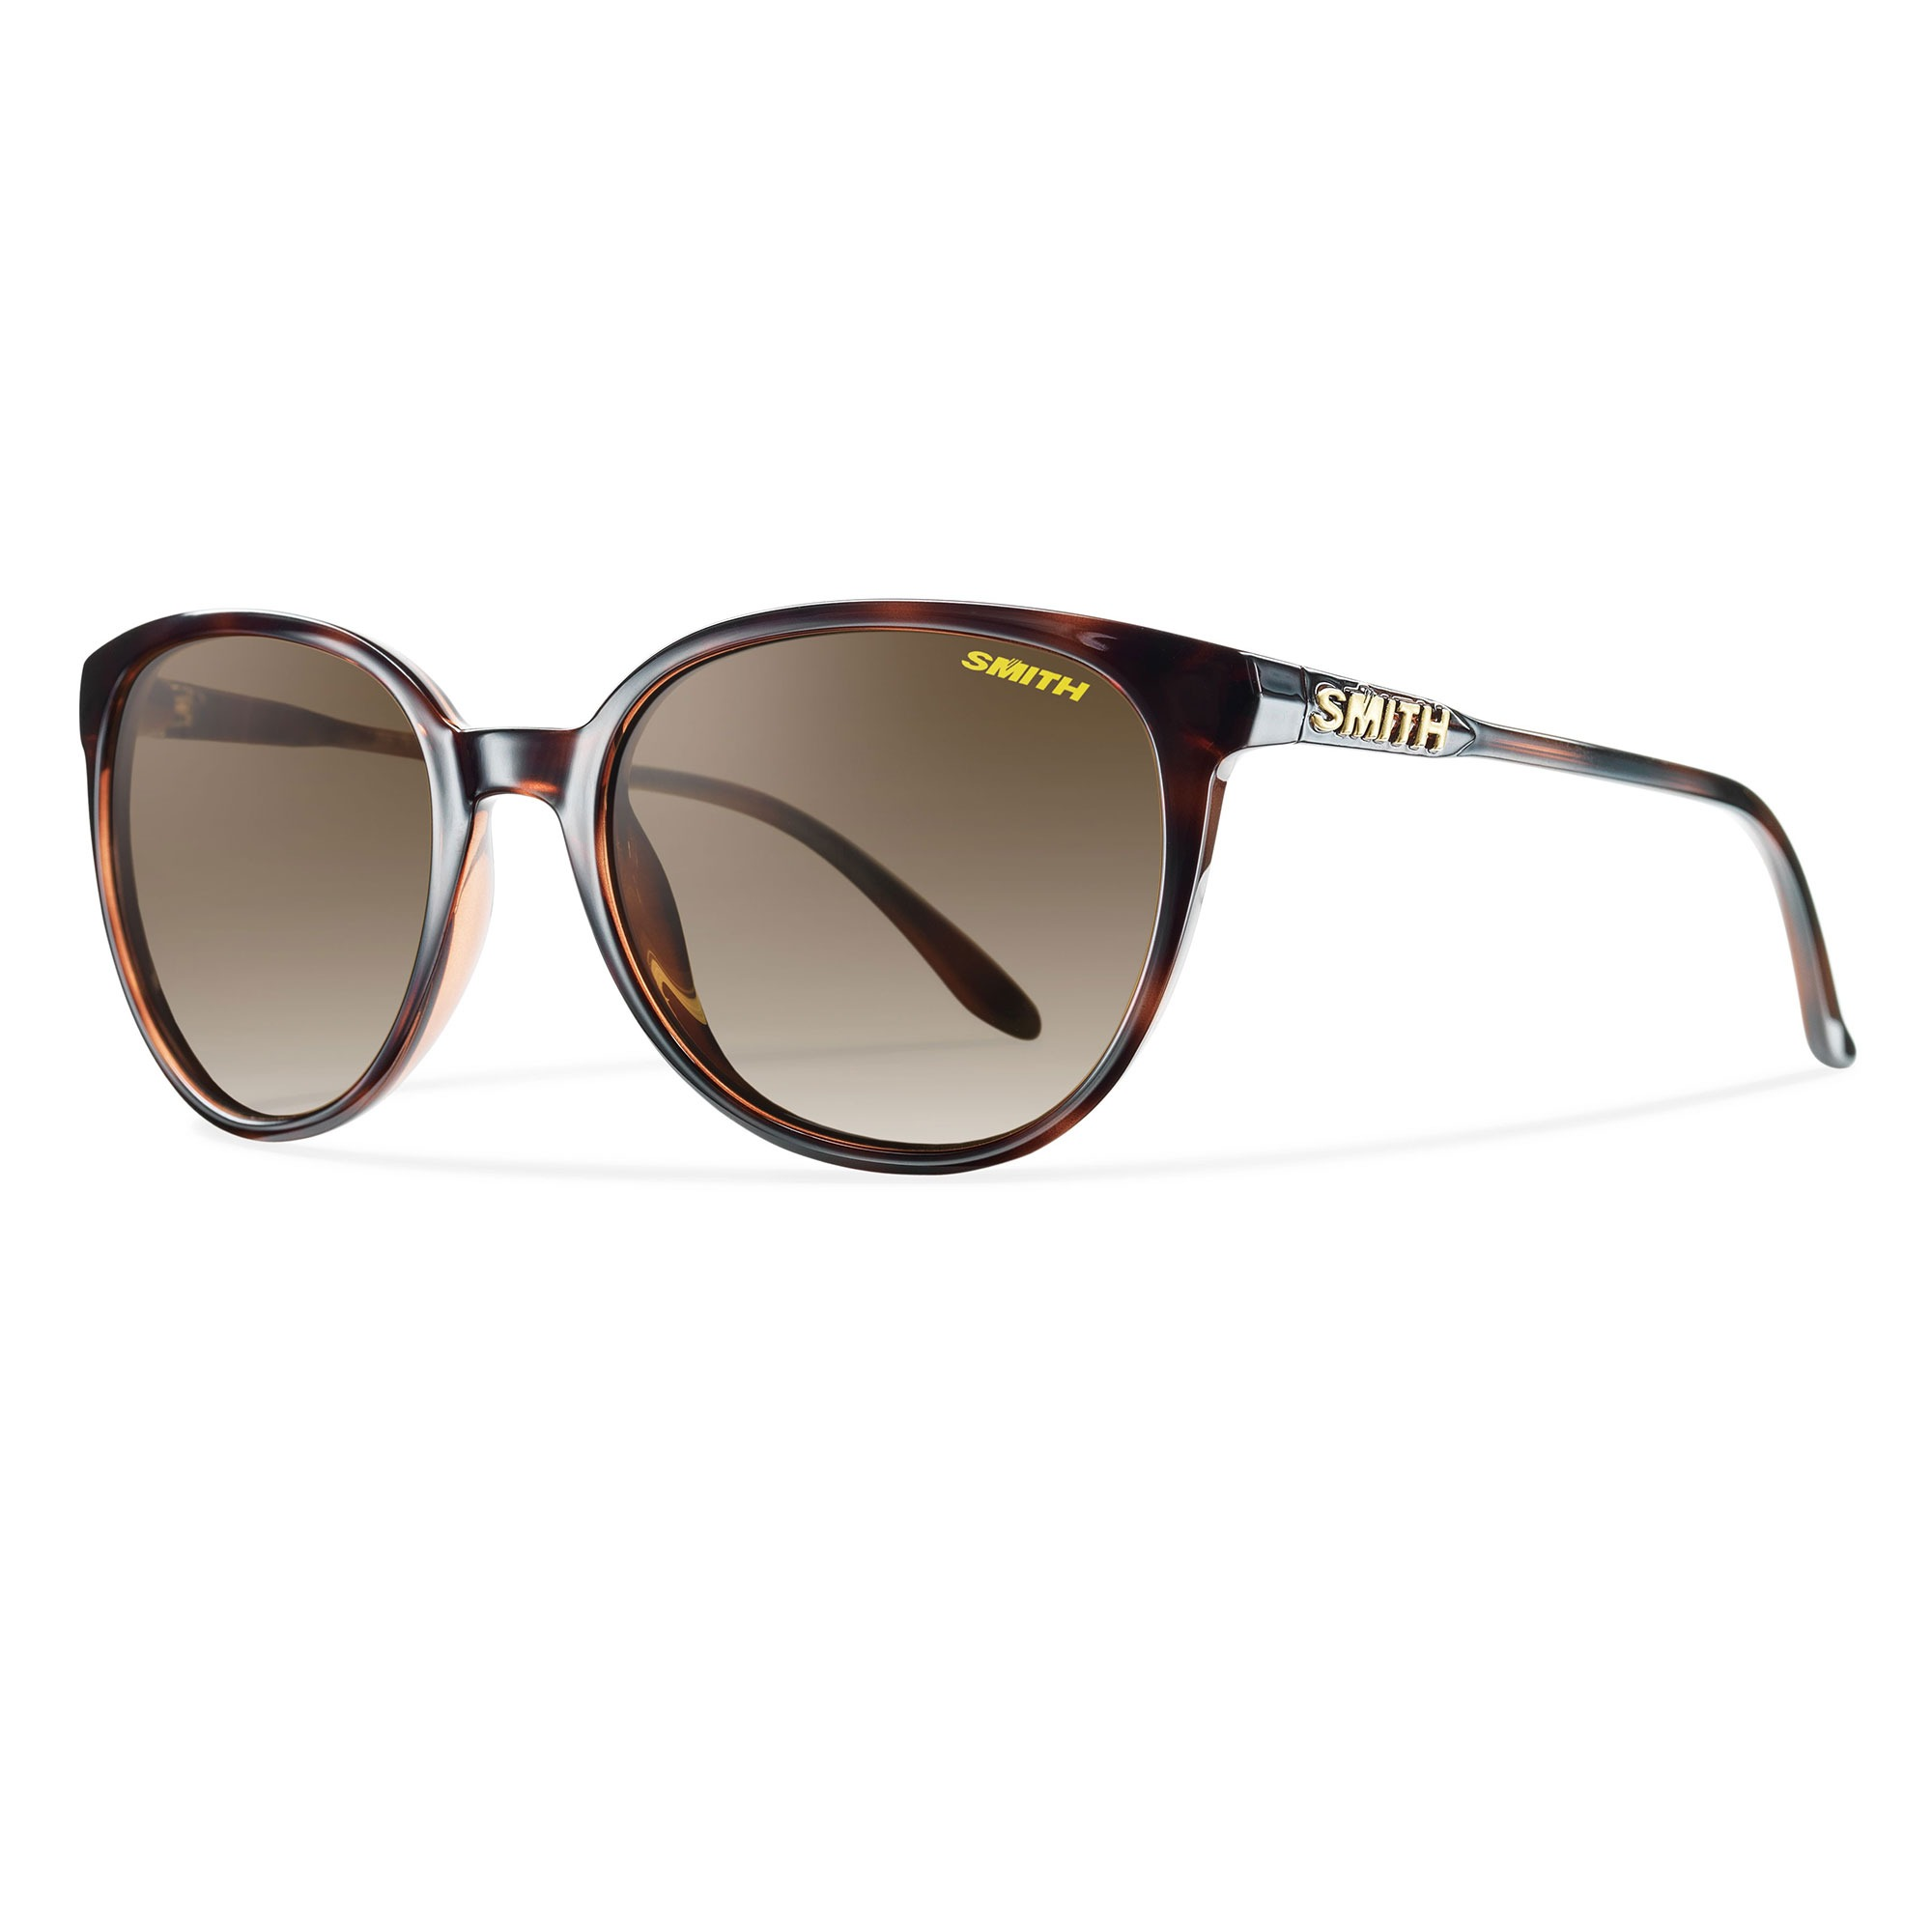 76ef4e5738428 SMITH Dockside with ChromaPop Havana BHV    Brown Polarized 63mm Sunglasses